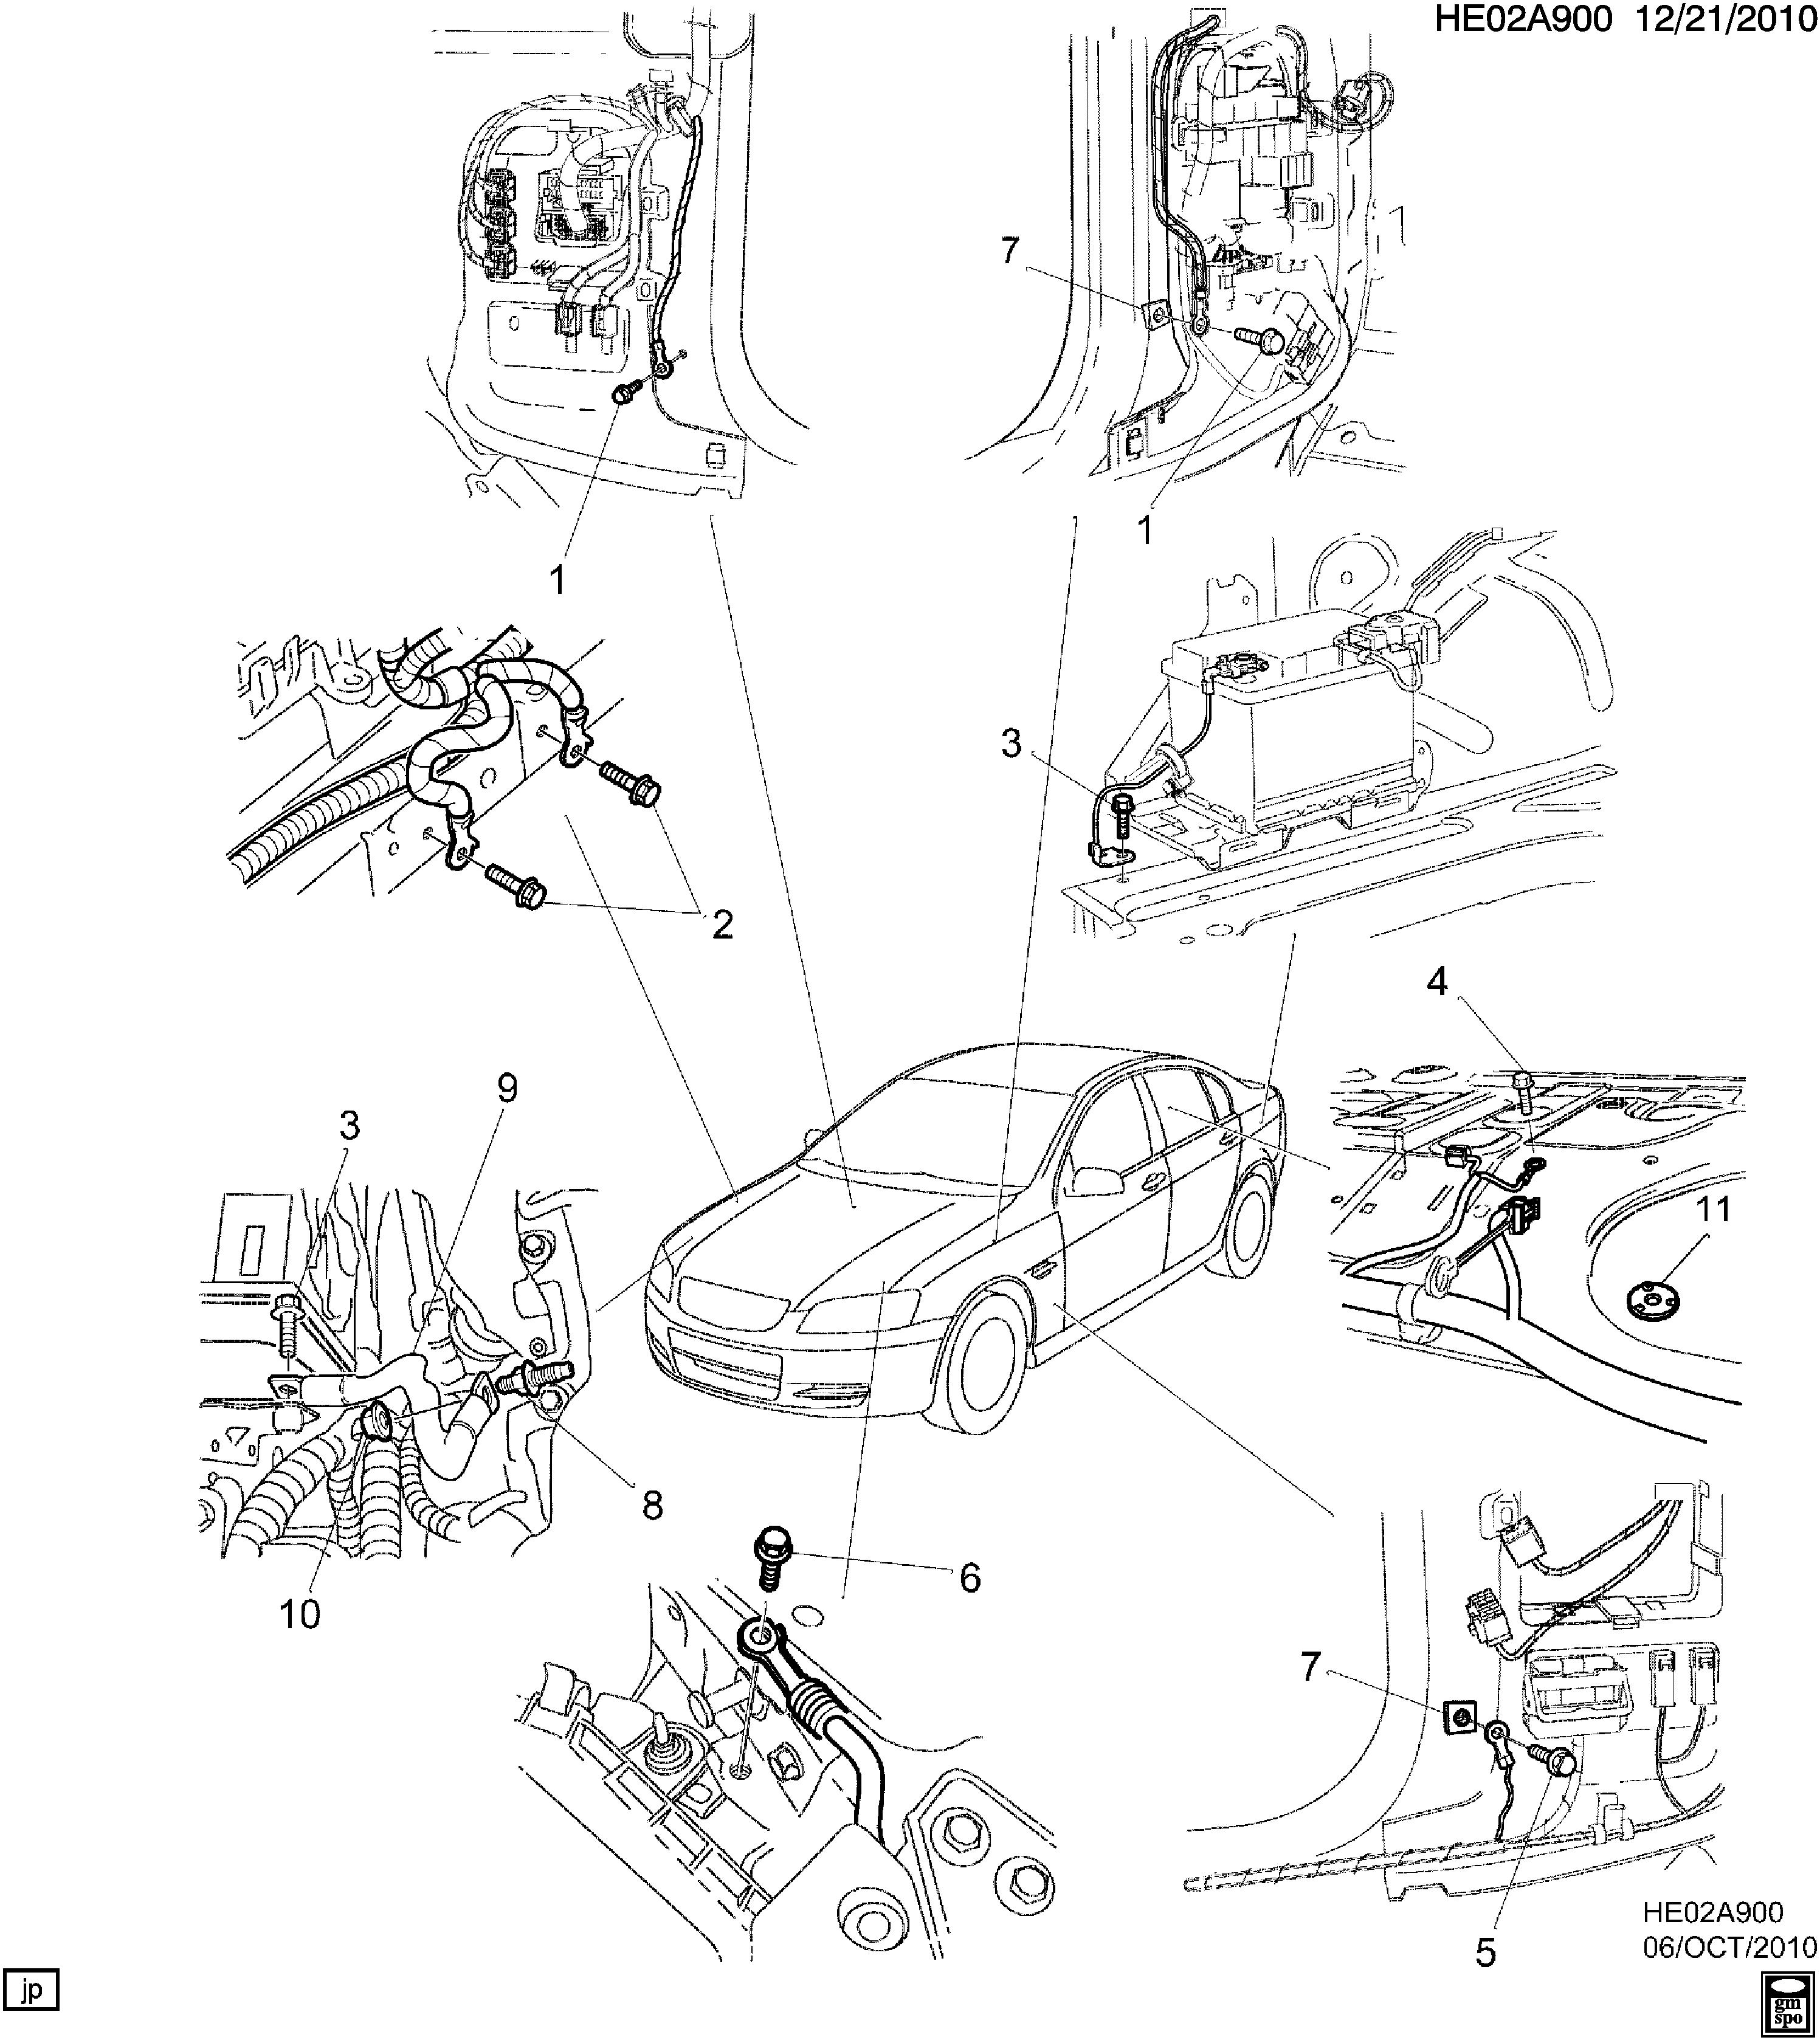 Pontiac G8 Wiring Diagram - Wiring Diagram